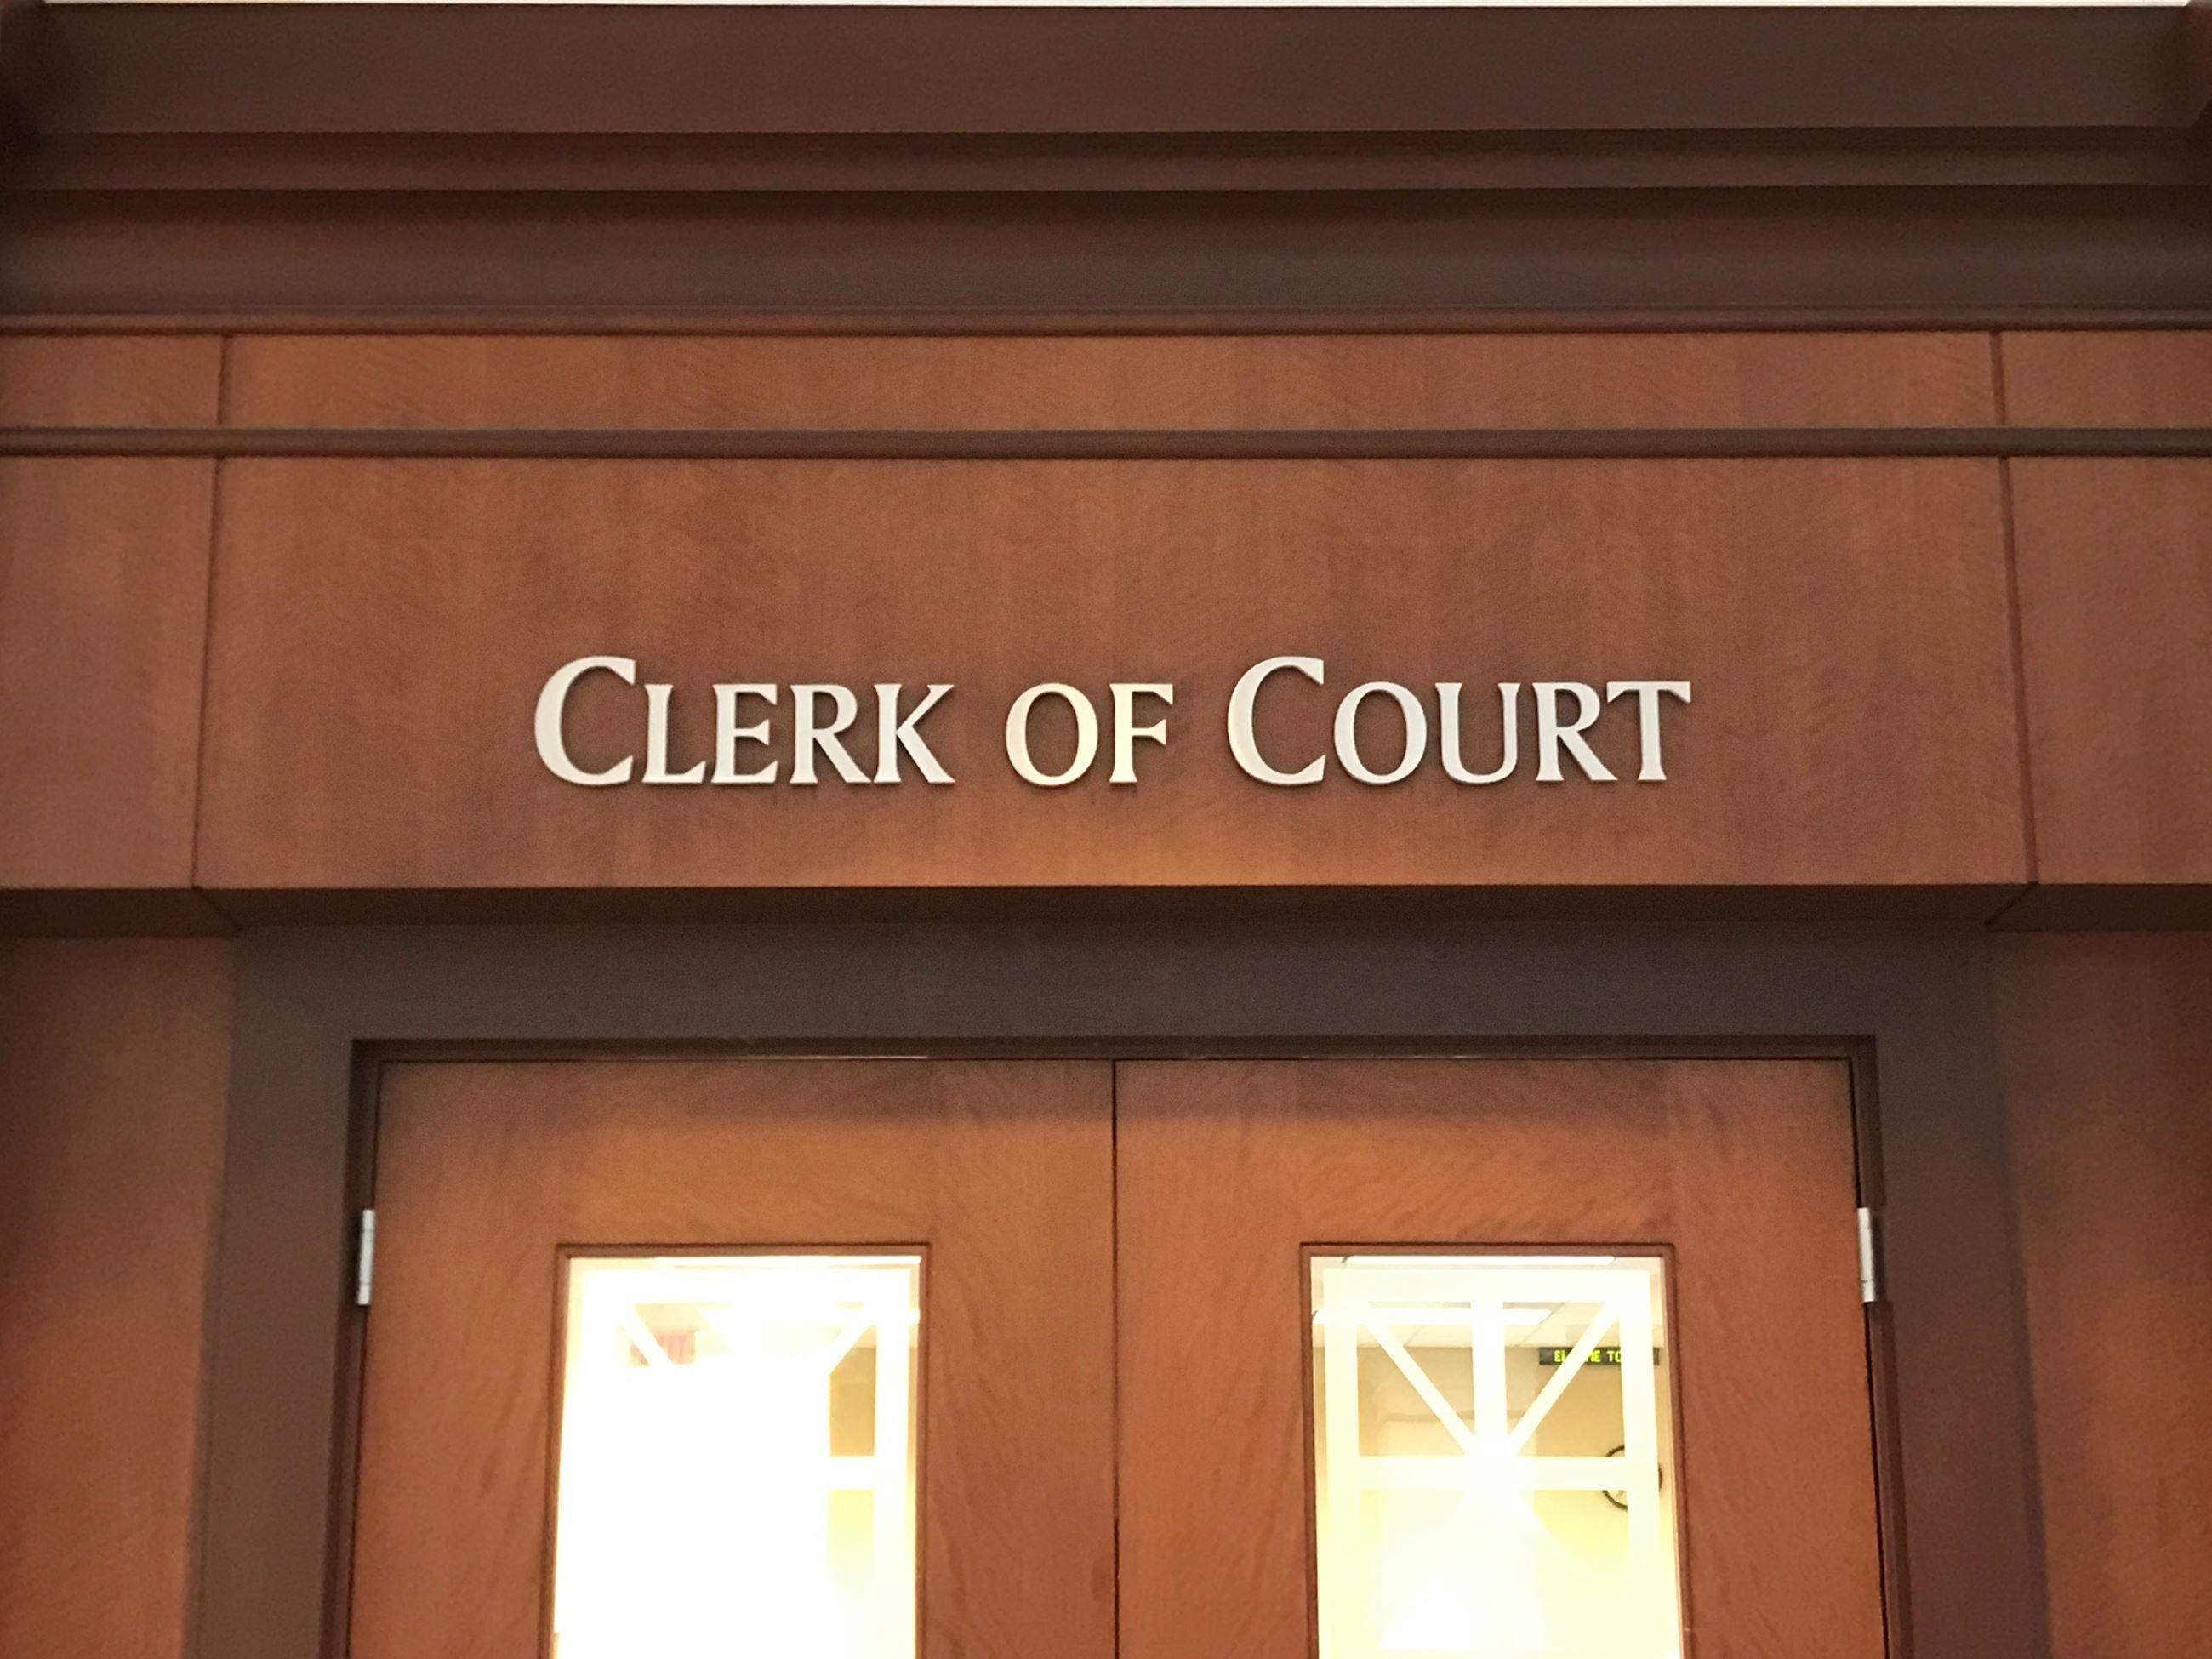 St. Lucie County Arrest Records in FL - Court & Criminal ...